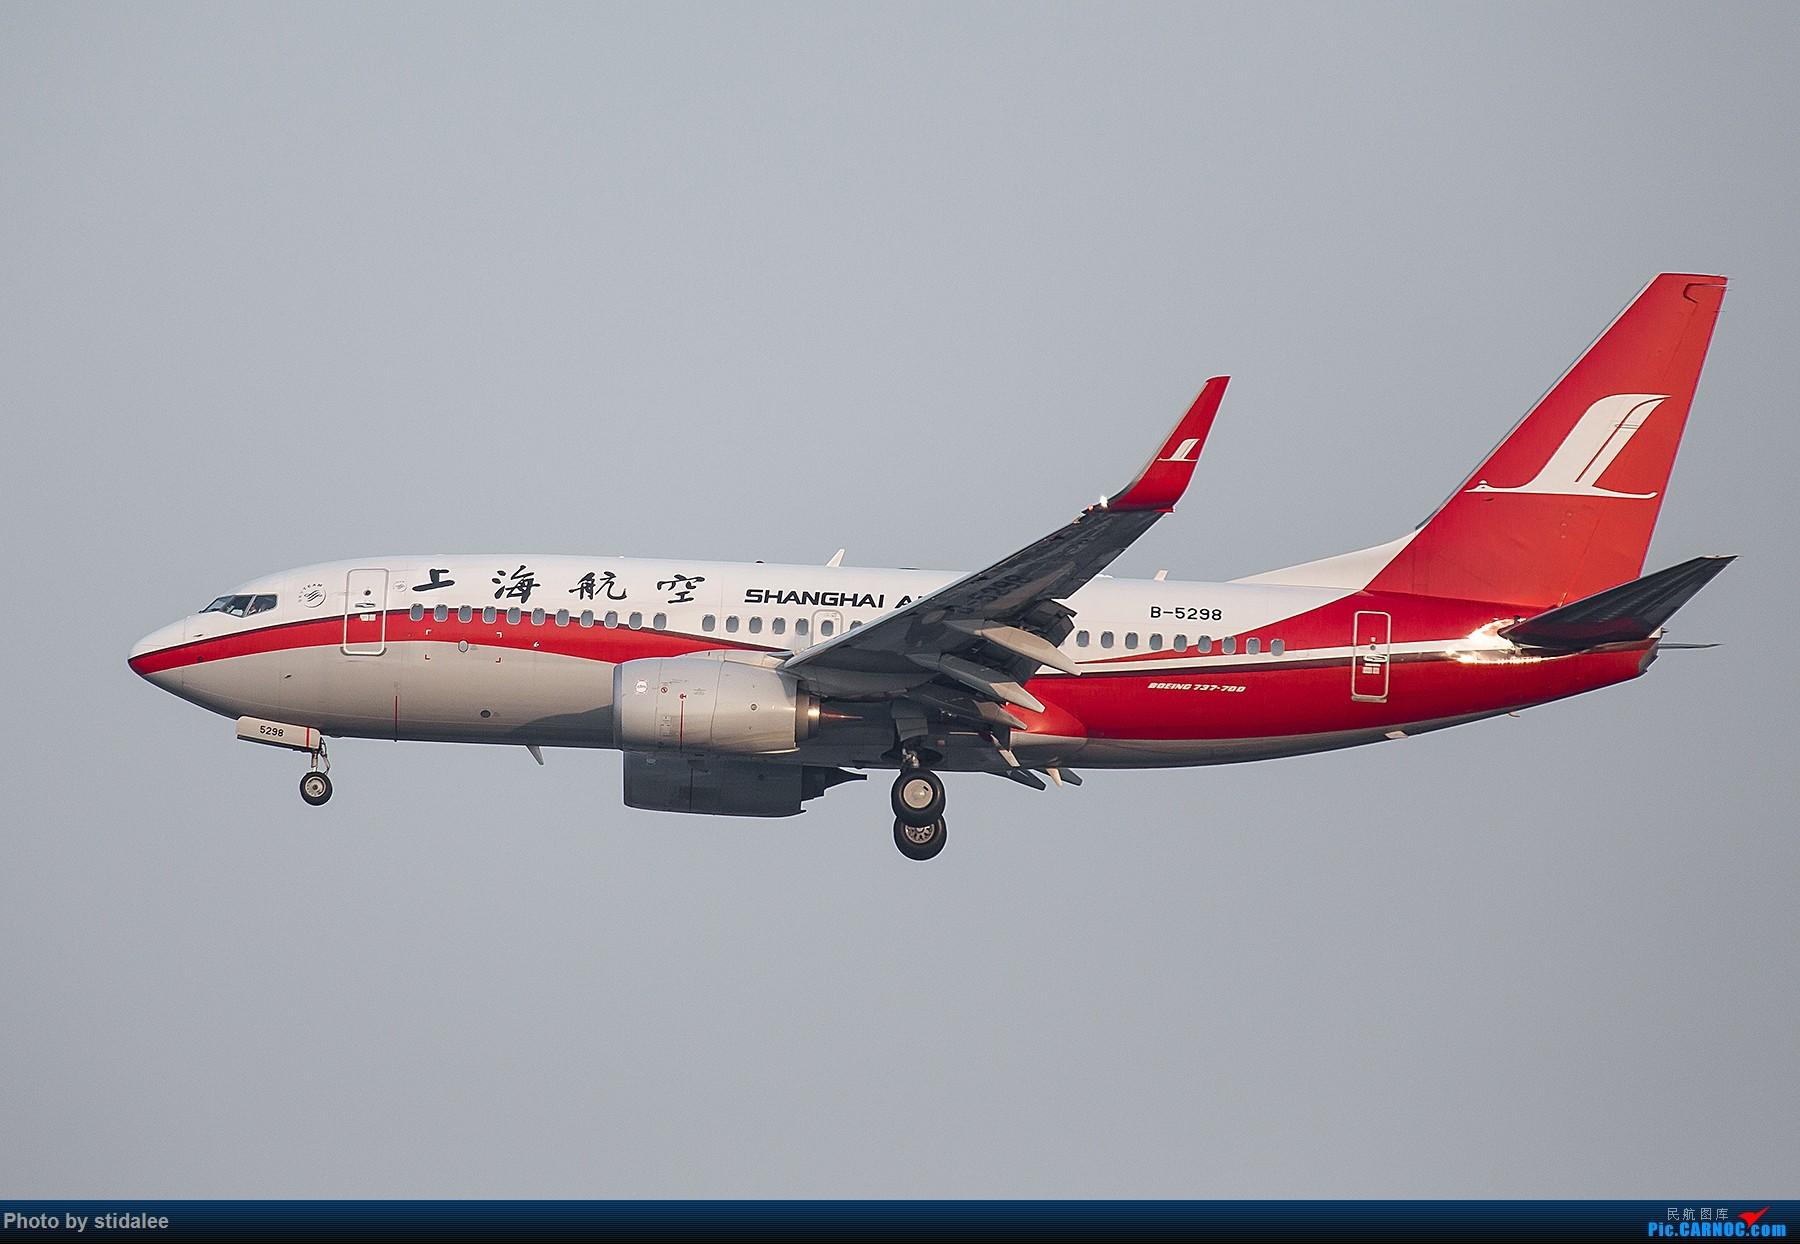 Re:[原创]SHA拍机 各种地主上航飞机 最喜欢的涂装 BOEING 737-700 B-5298 中国上海虹桥国际机场